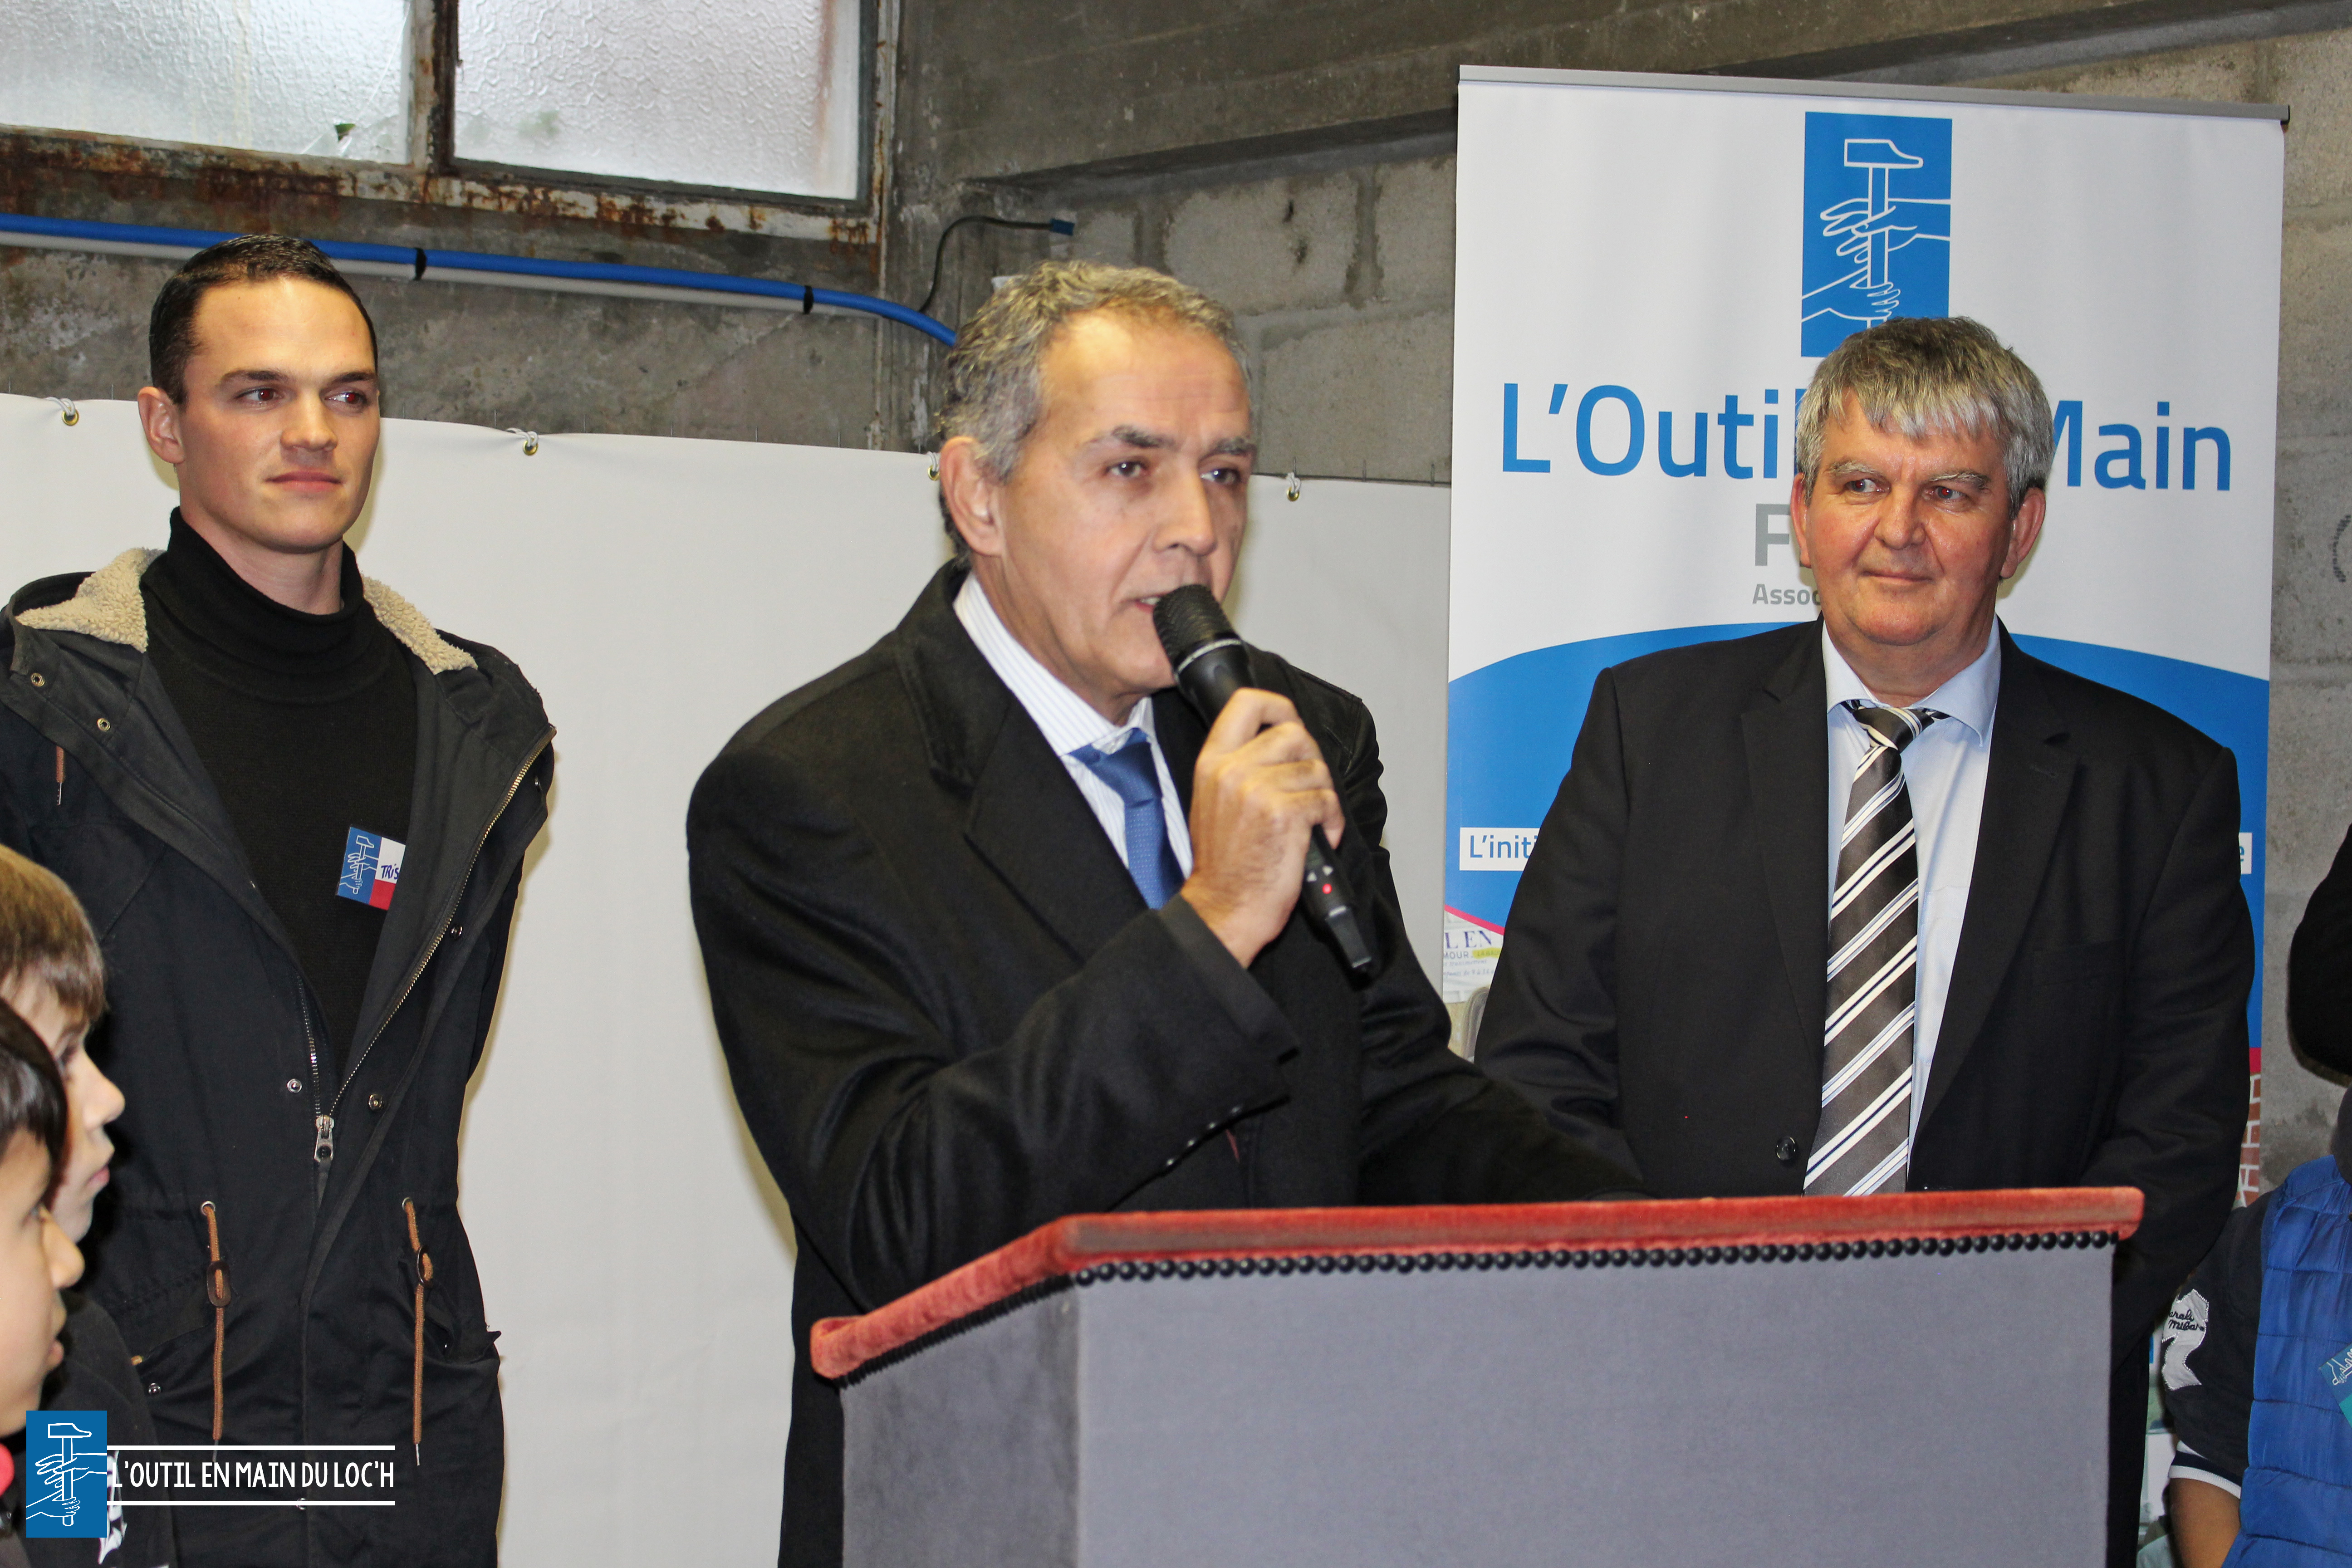 loutilenmainduloch-raymond-le-deun-prefet-morbihan-inauguration-outil-en-main-grand-champ